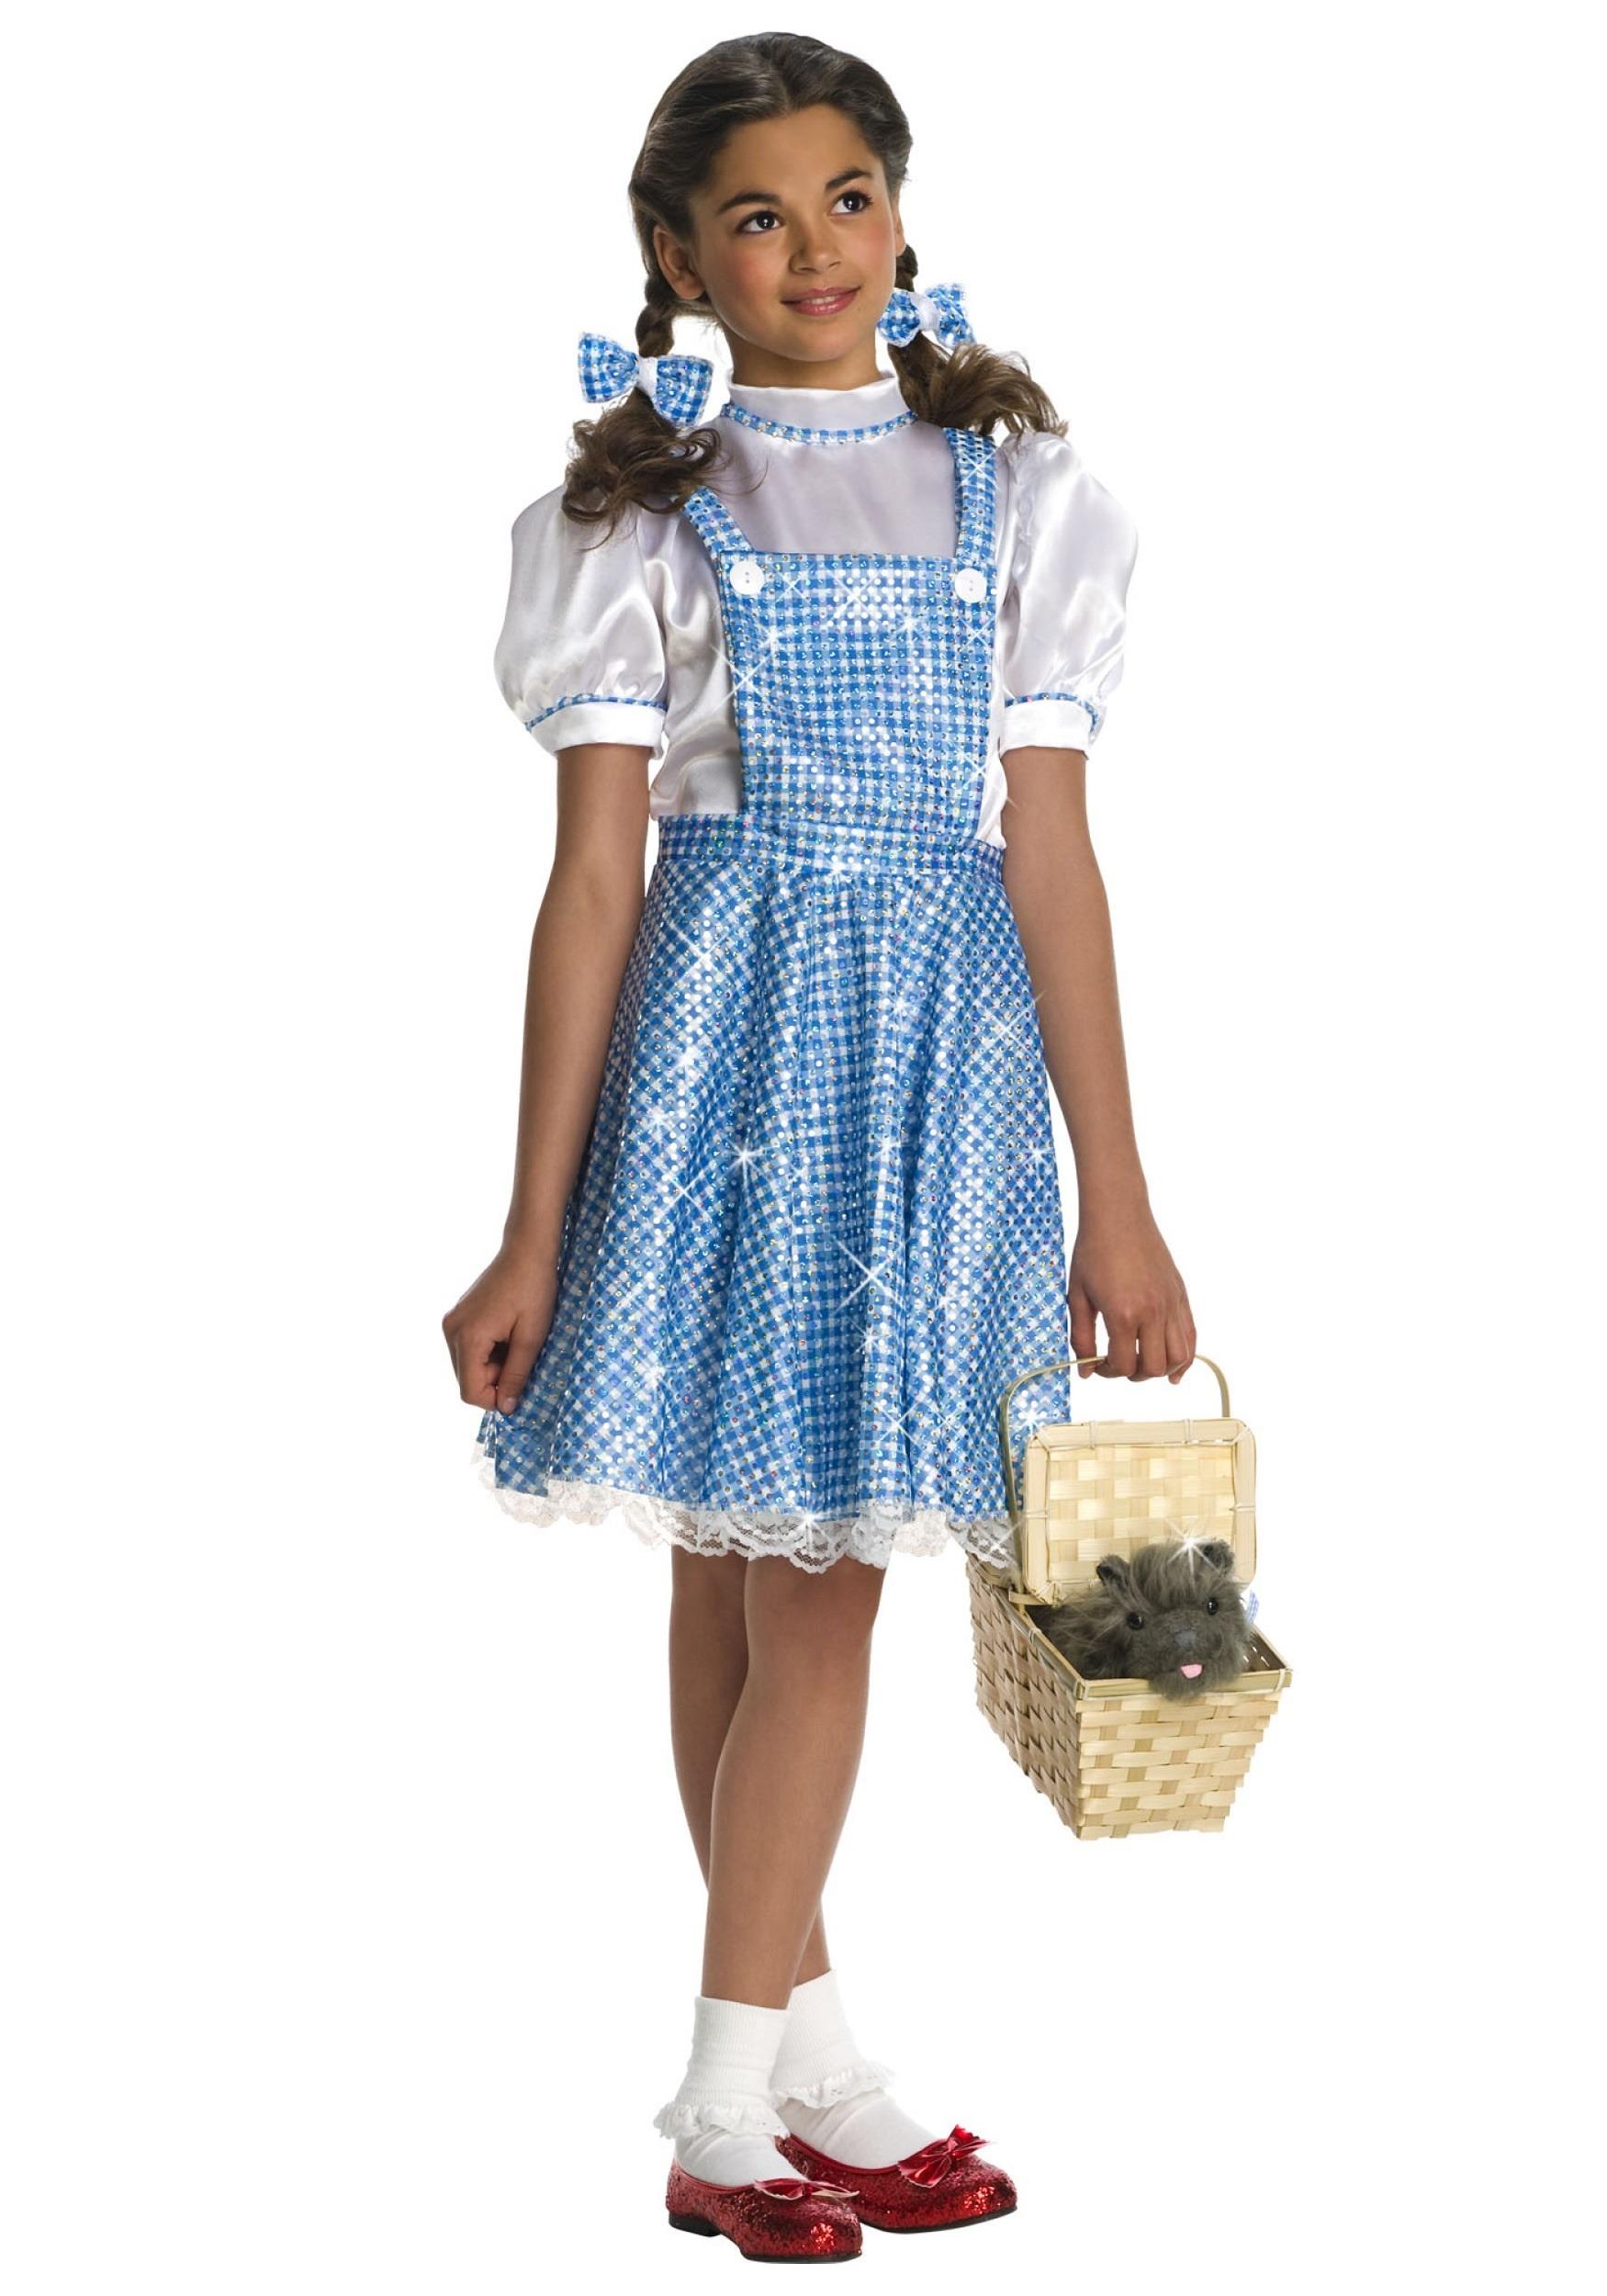 Sequin Dorothy Costume for Girls W/ Dress & Hair Ribbons